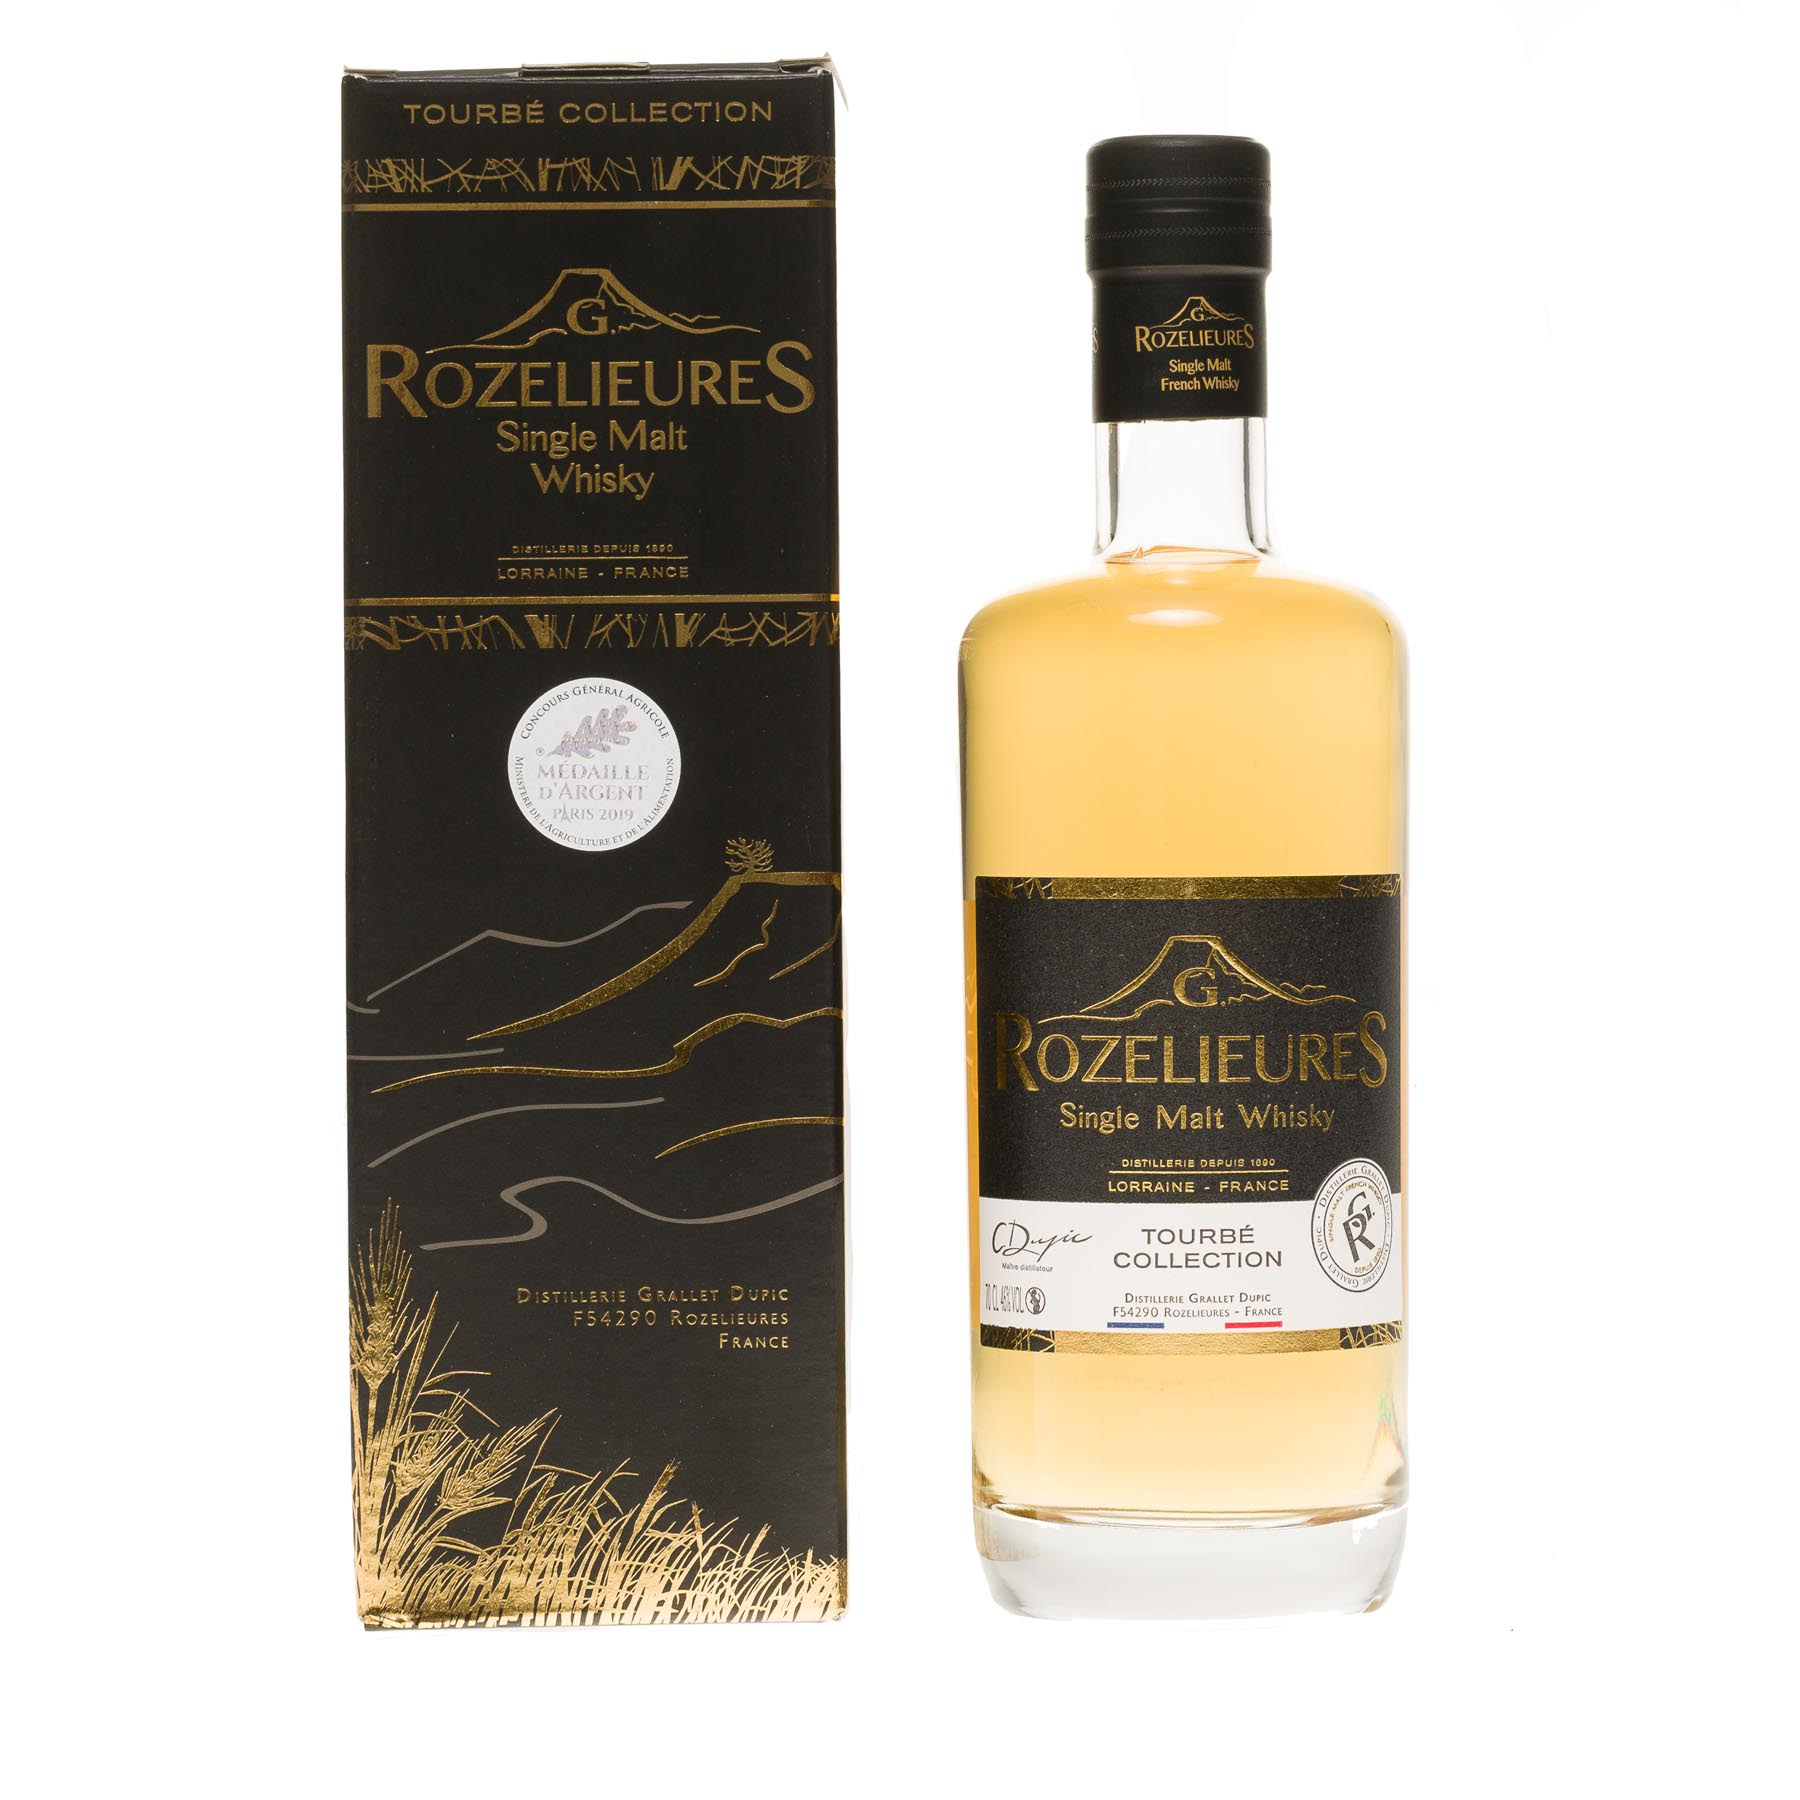 Whisky single malt G. Rozelieures Tourbé collection, 46°